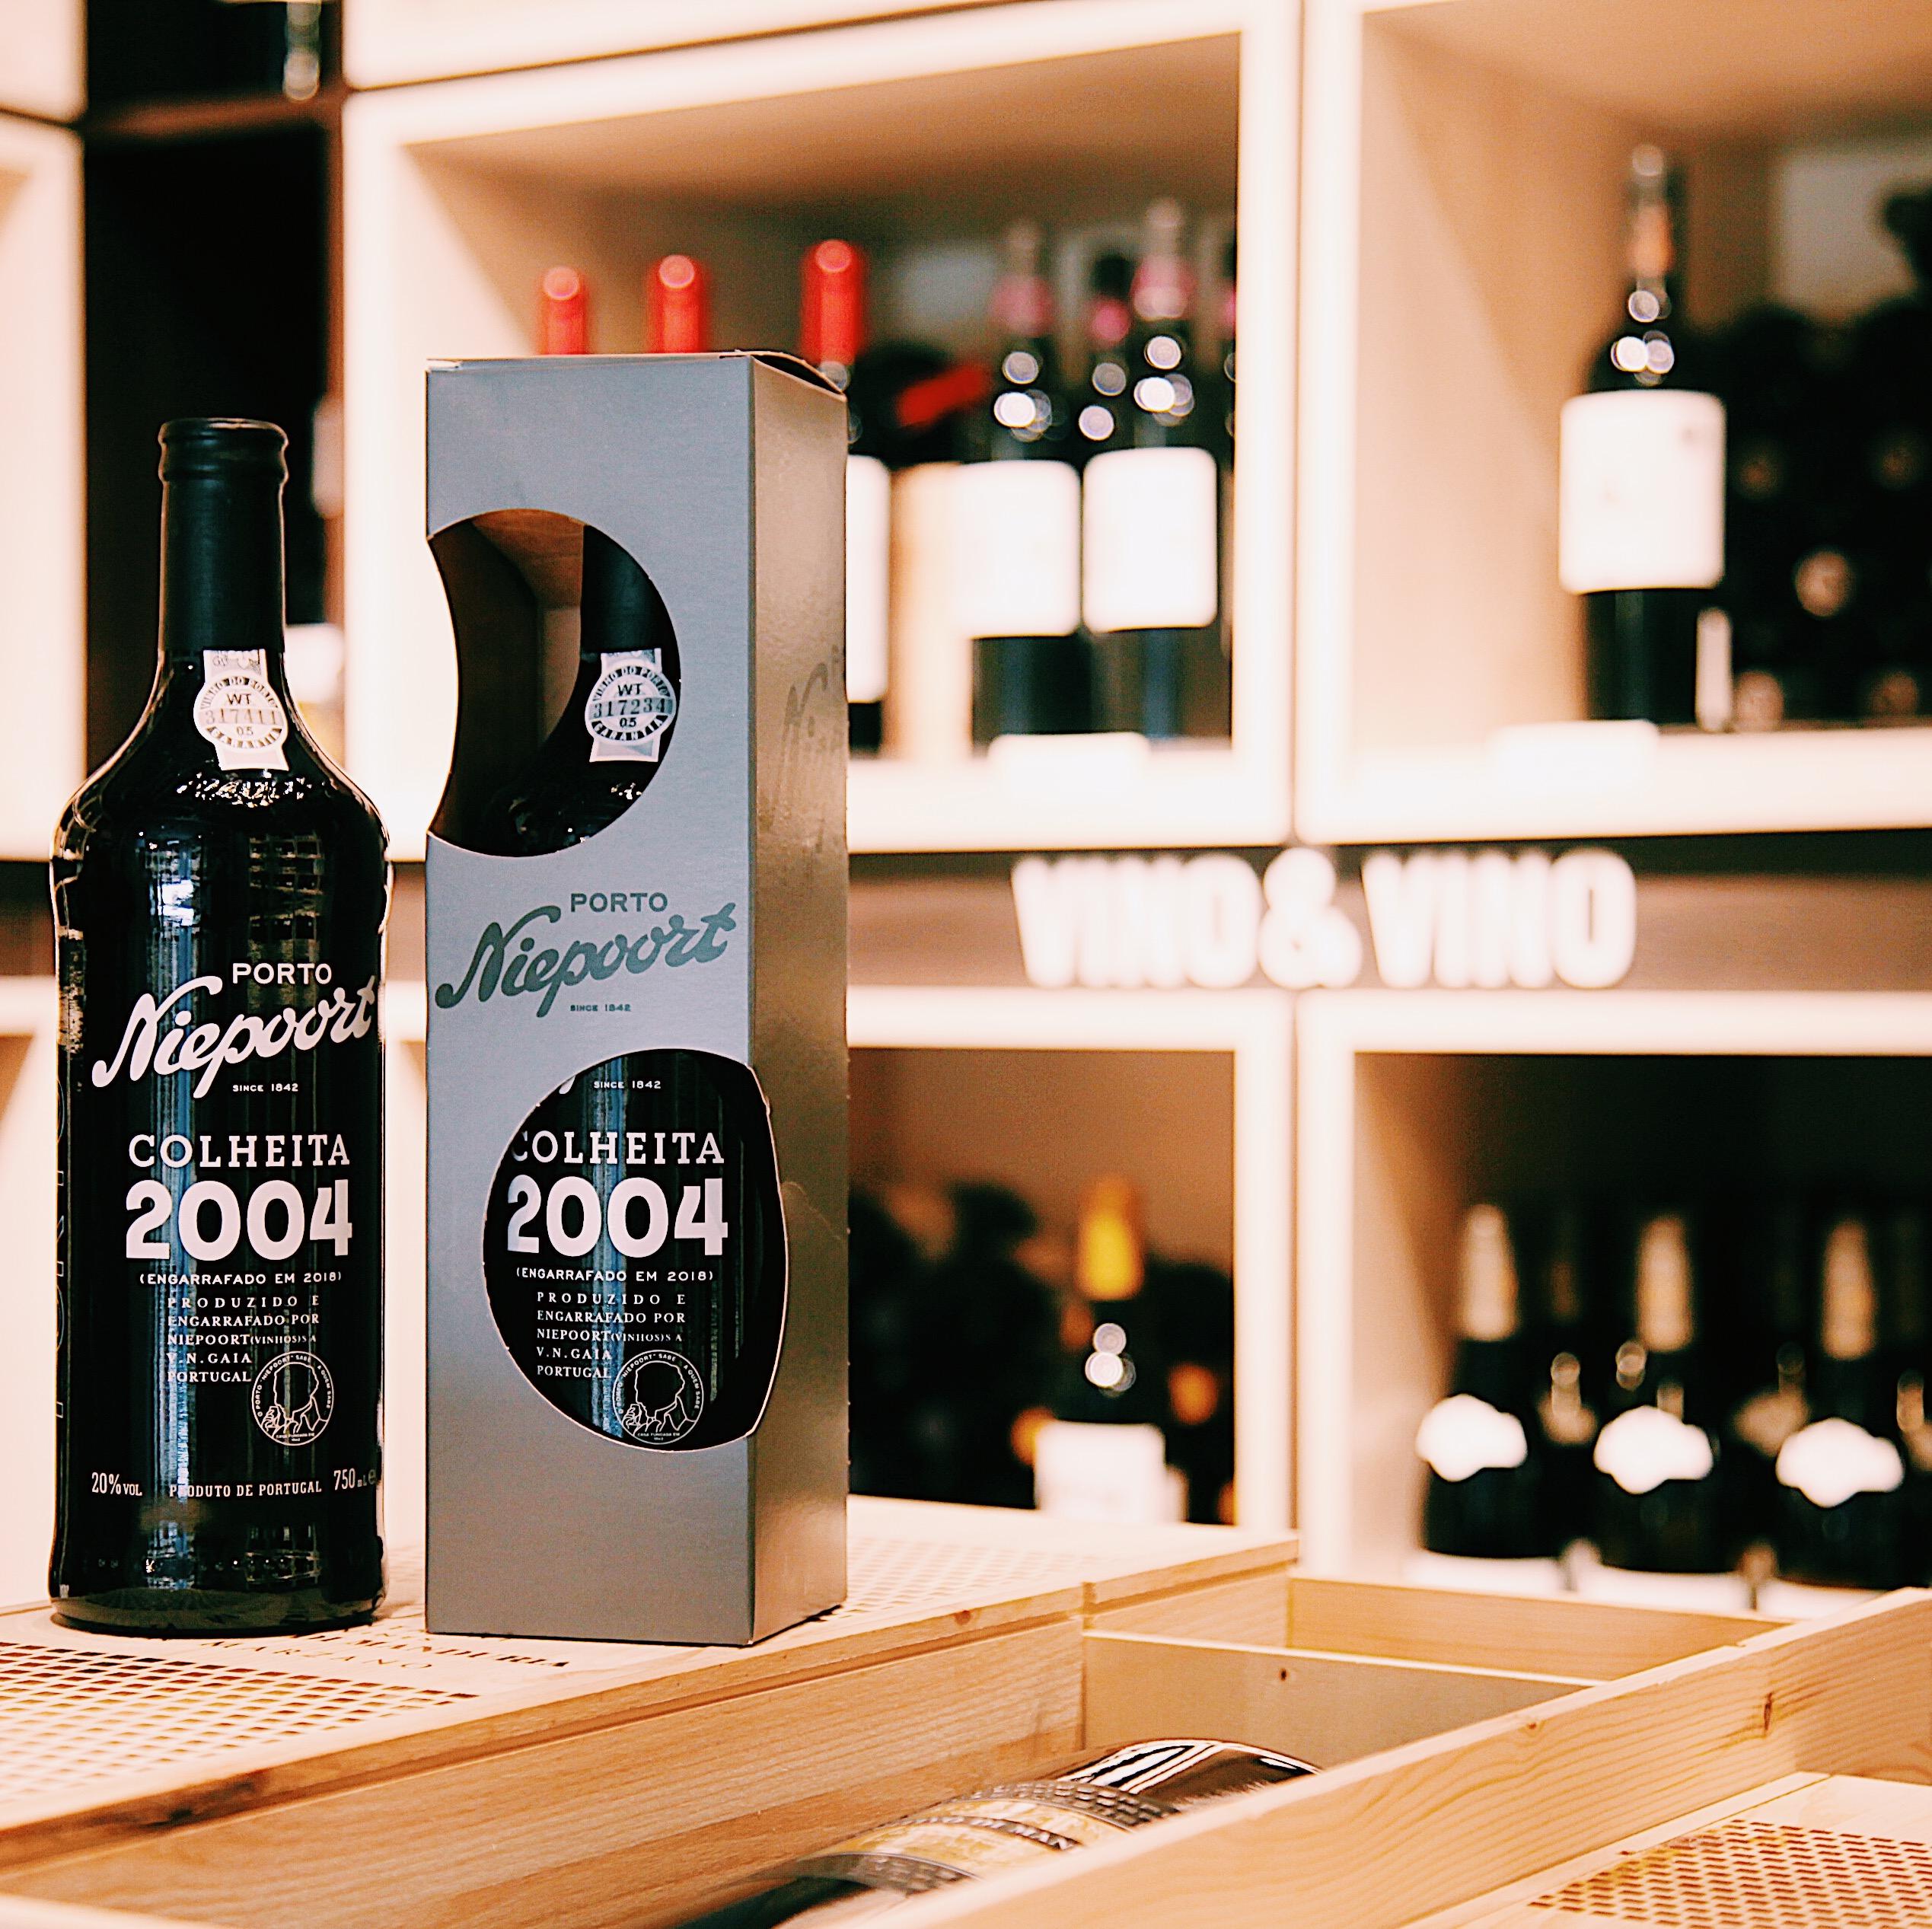 Port Colheita 2004